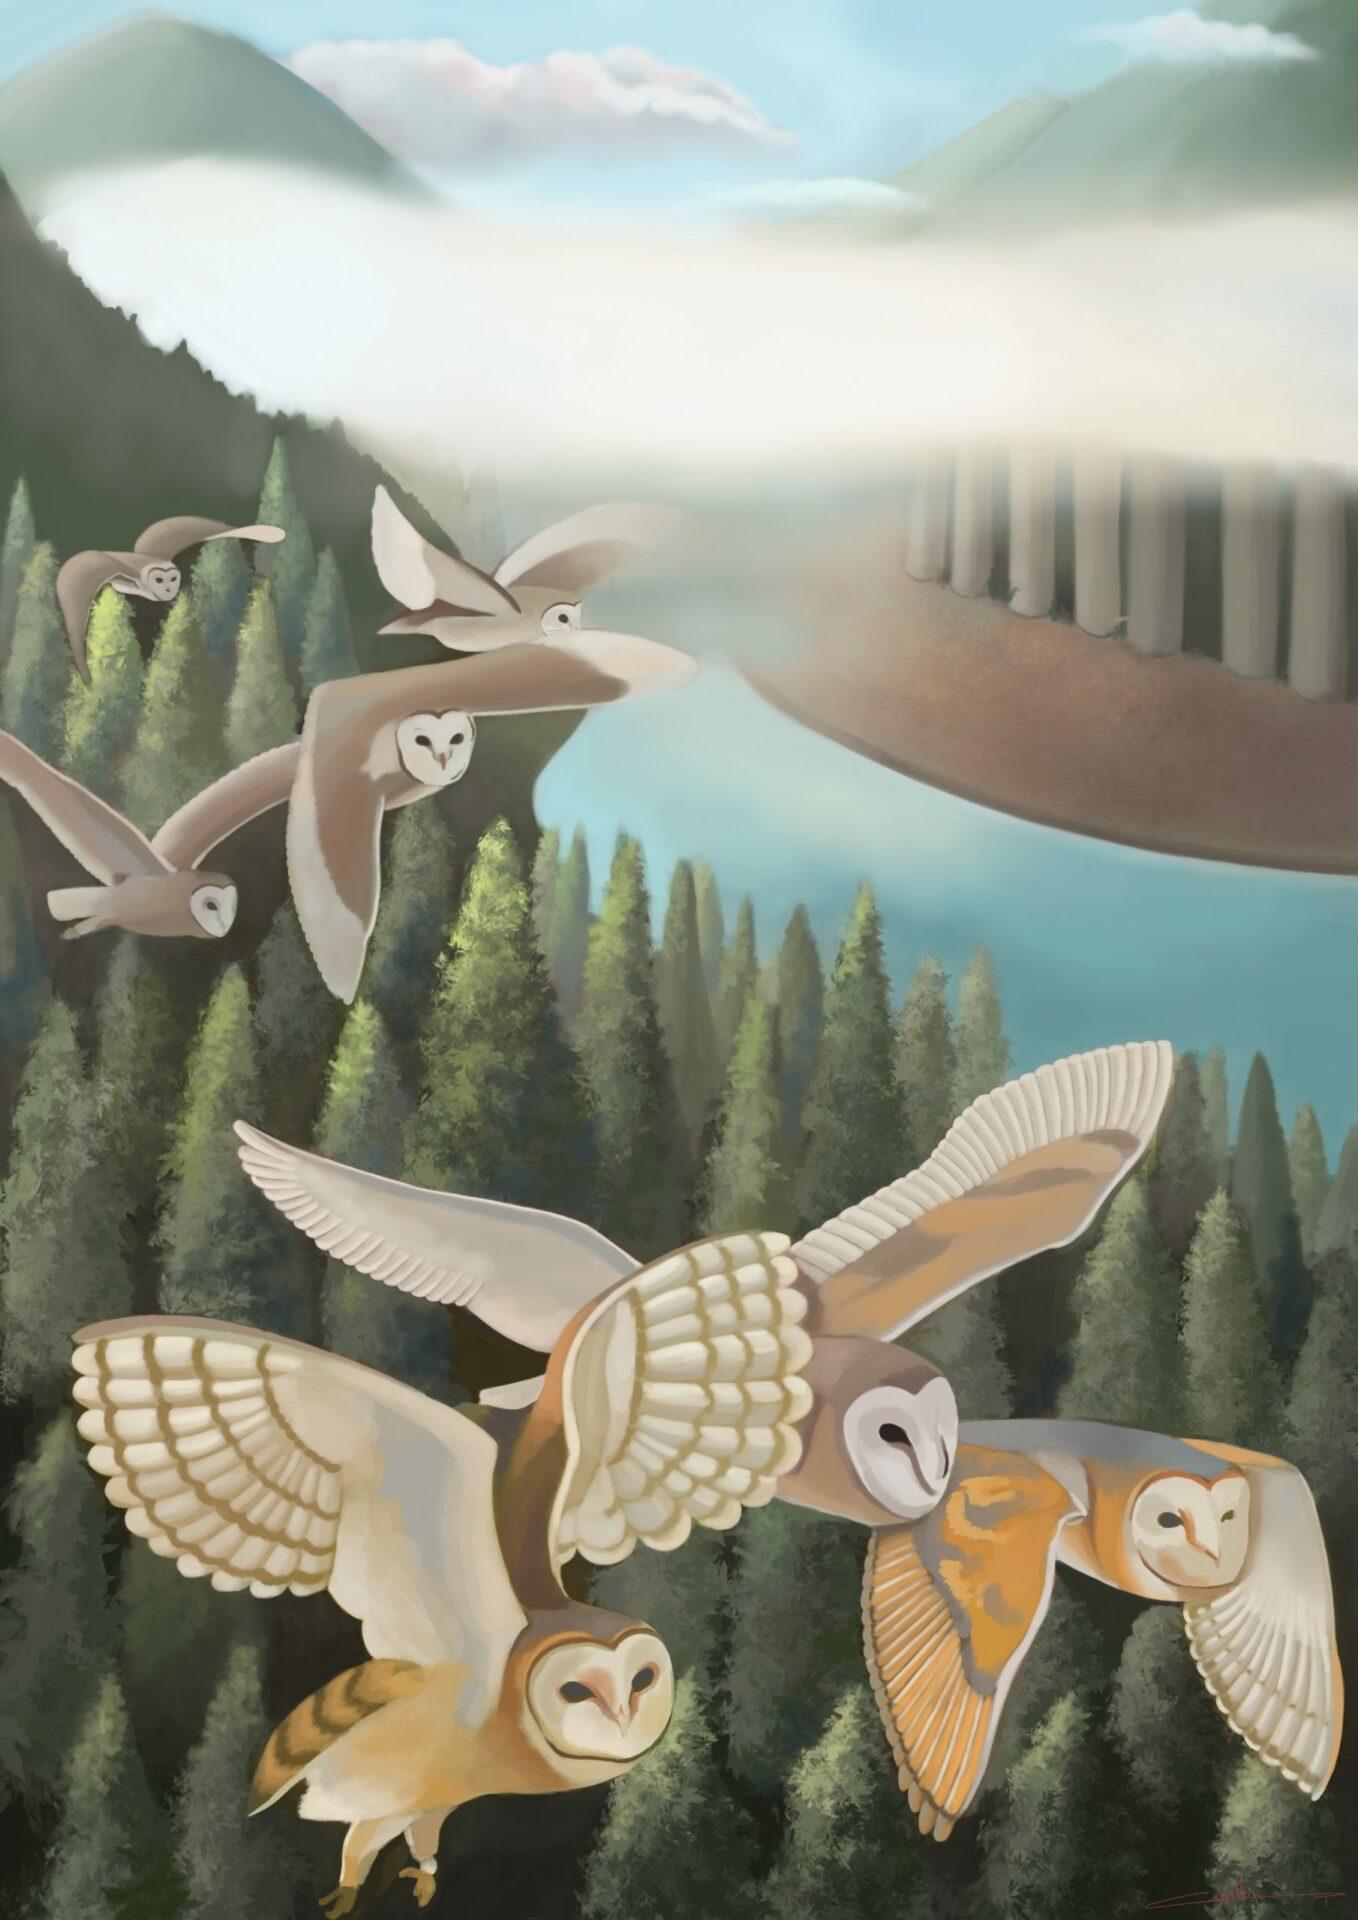 Migration illustration de Cynthia Artstudio